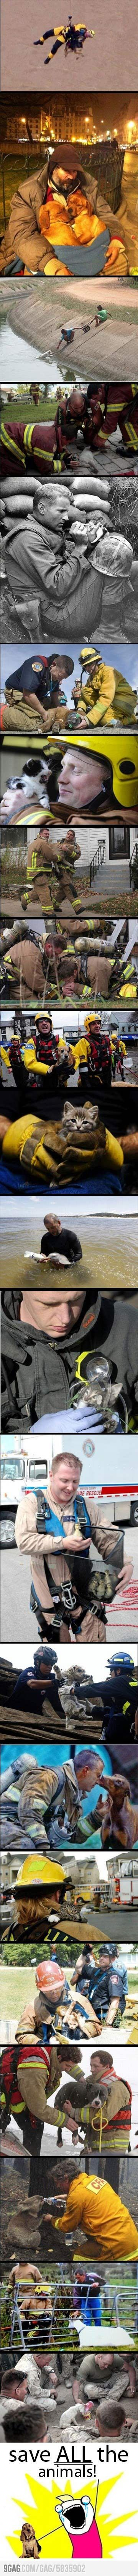 Heros rescuing animals. Too sweet.